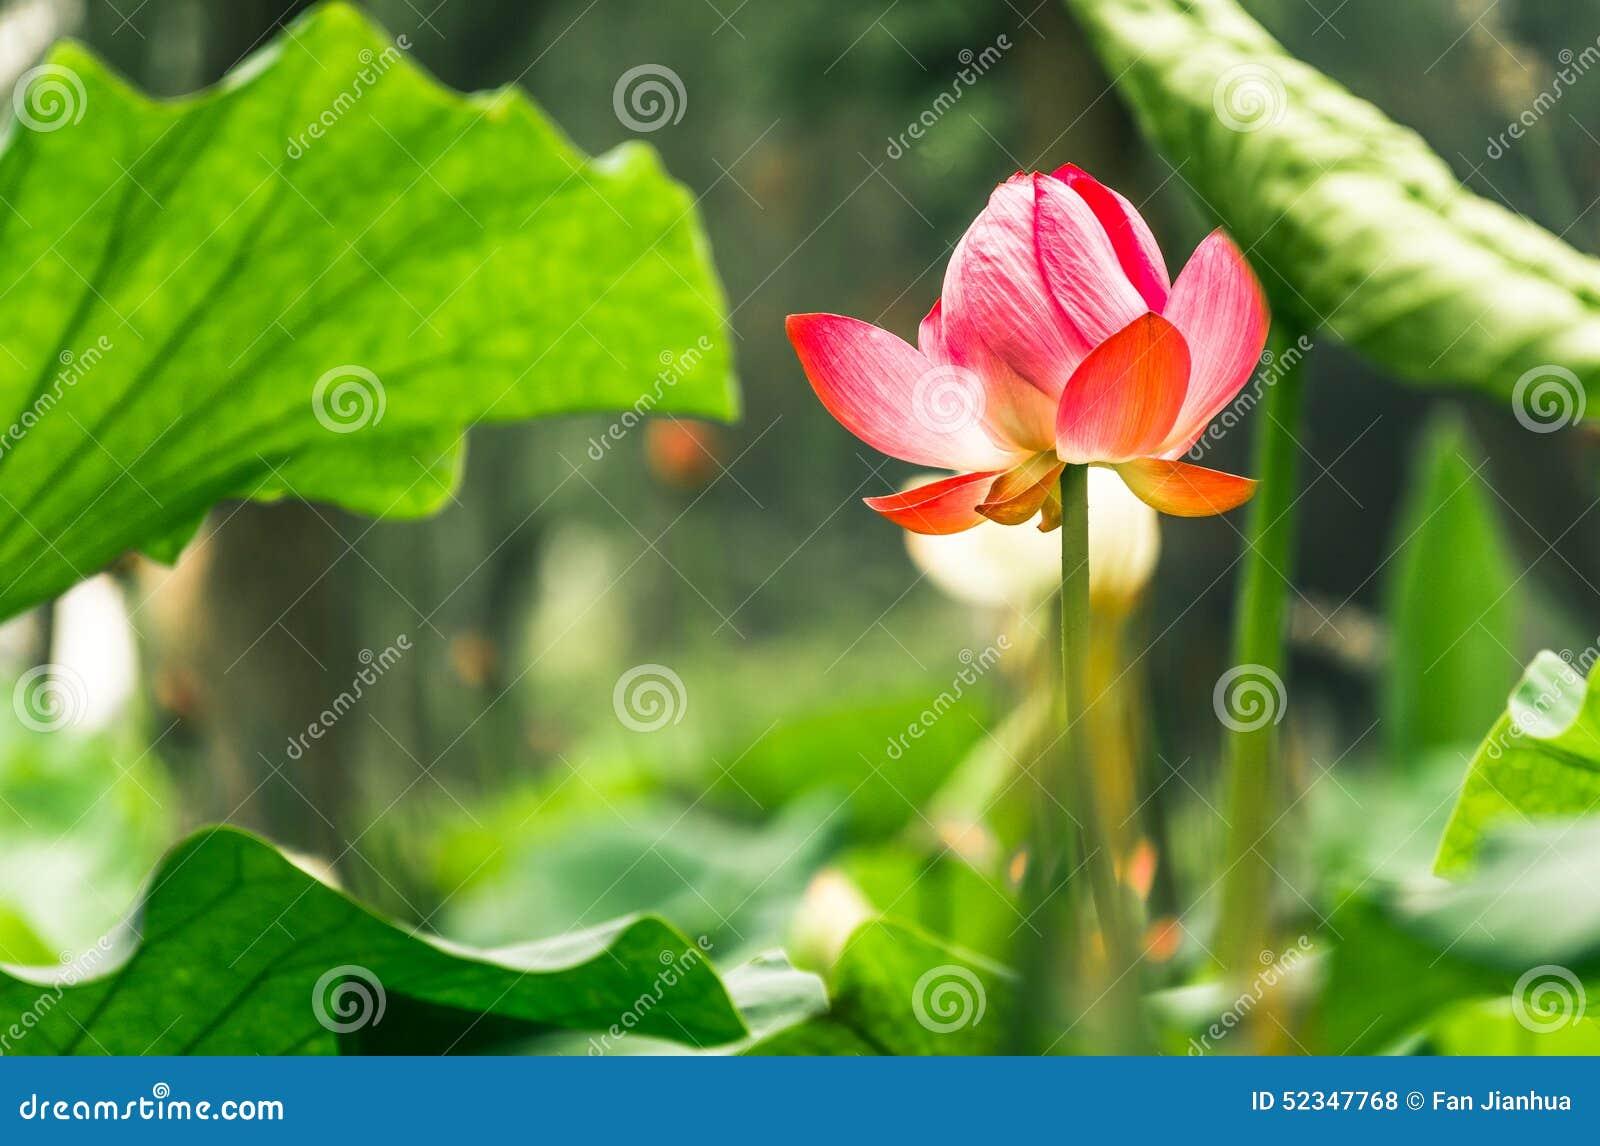 Lotus pond stock photo image of growth flourish flowers 52347768 royalty free stock photo izmirmasajfo